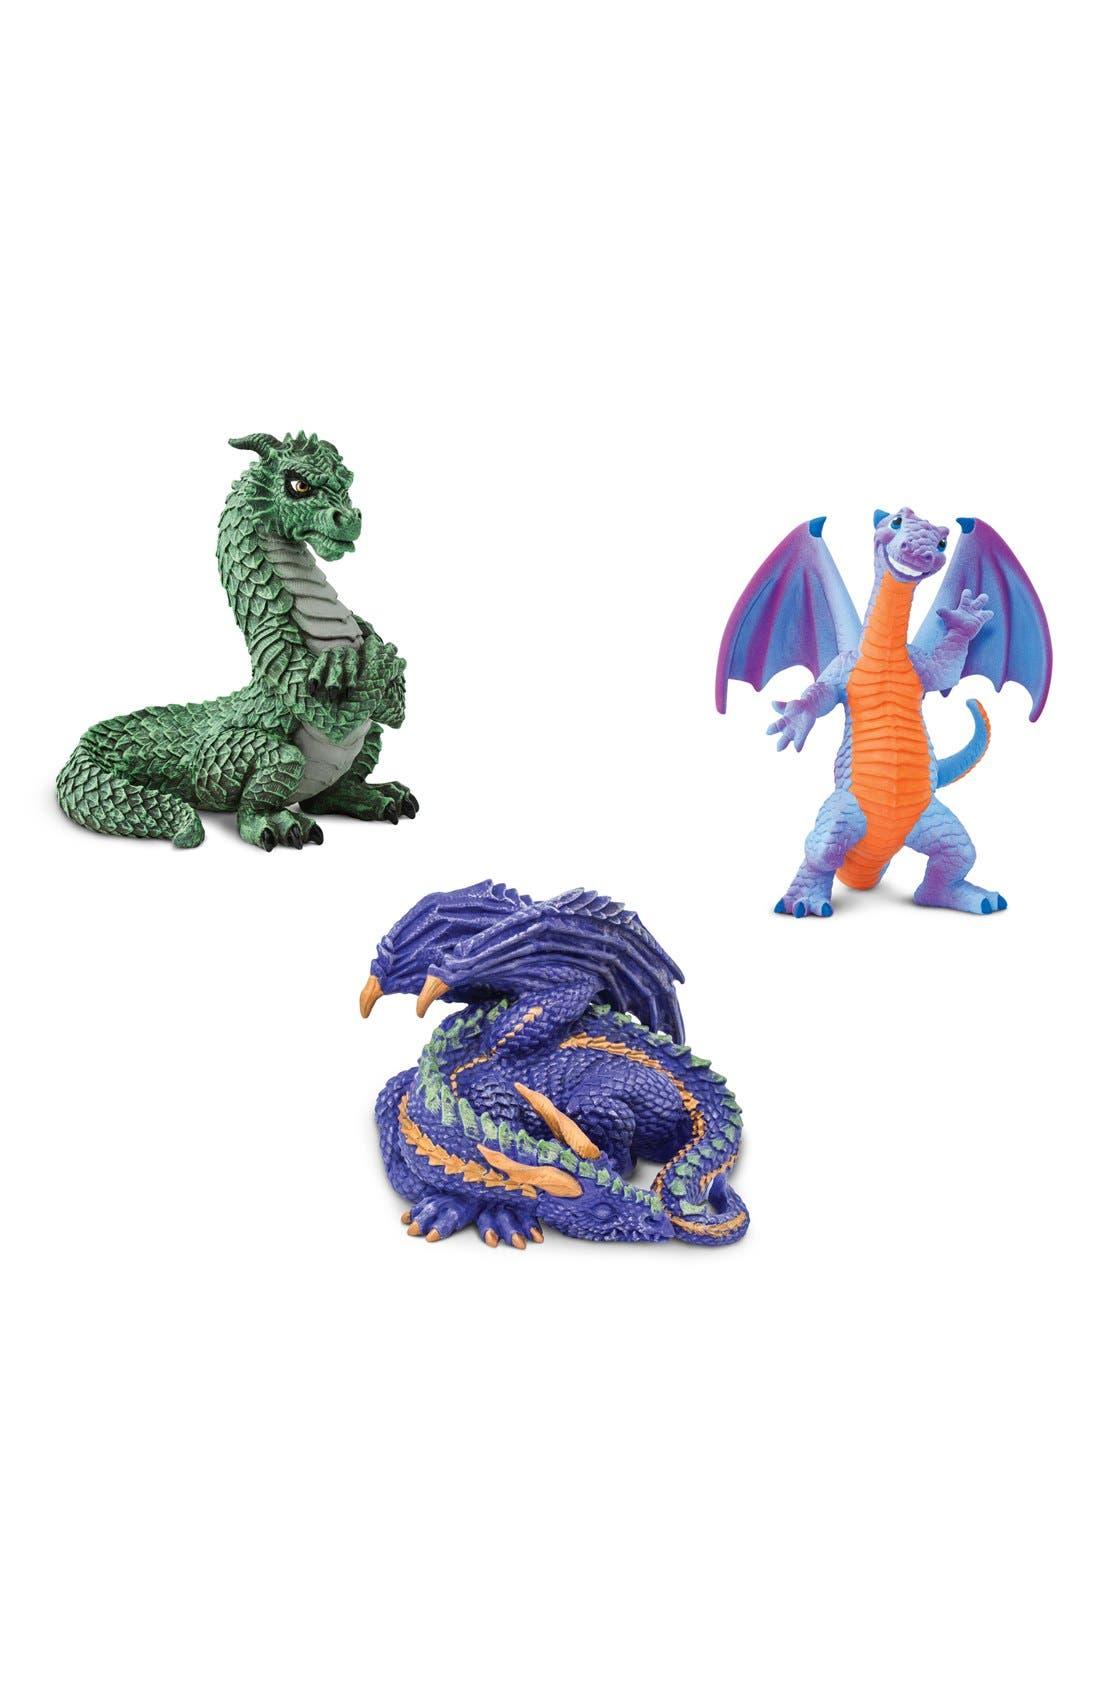 Safari Ltd. Dragon Figurines (Set of 3)